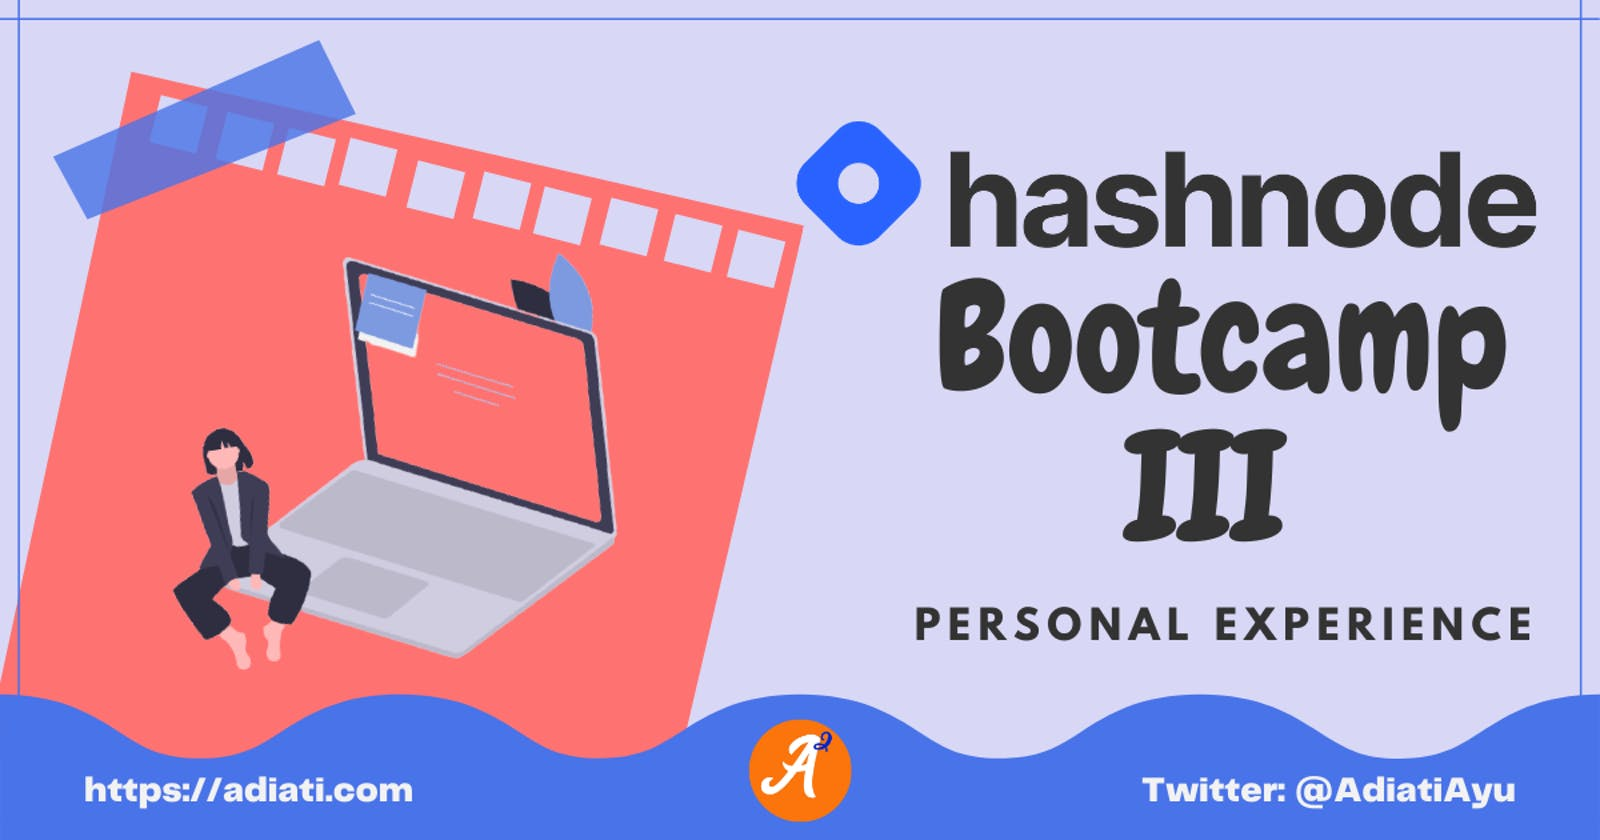 Hashnode Bootcamp III: Personal Experience